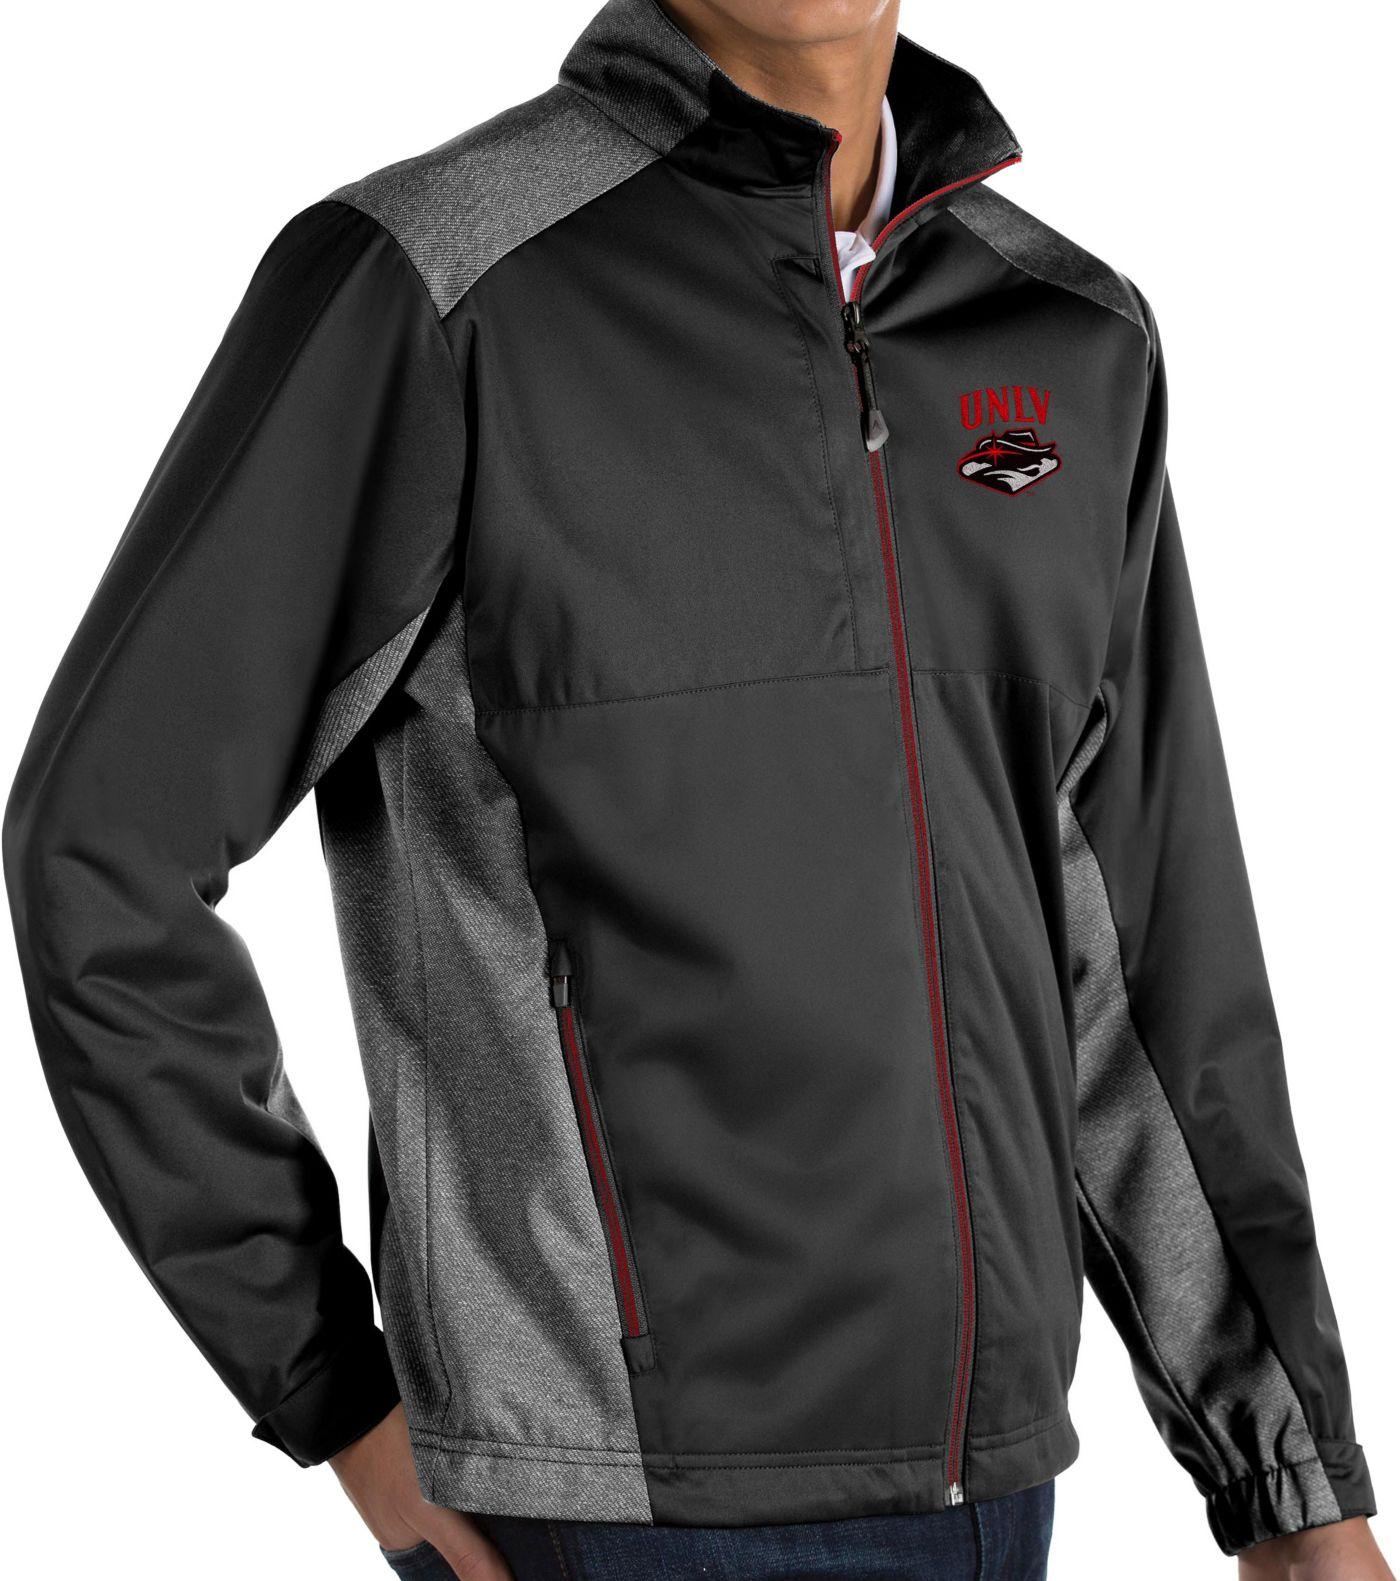 Antigua Men's UNLV Rebels Revolve Full-Zip Black Jacket